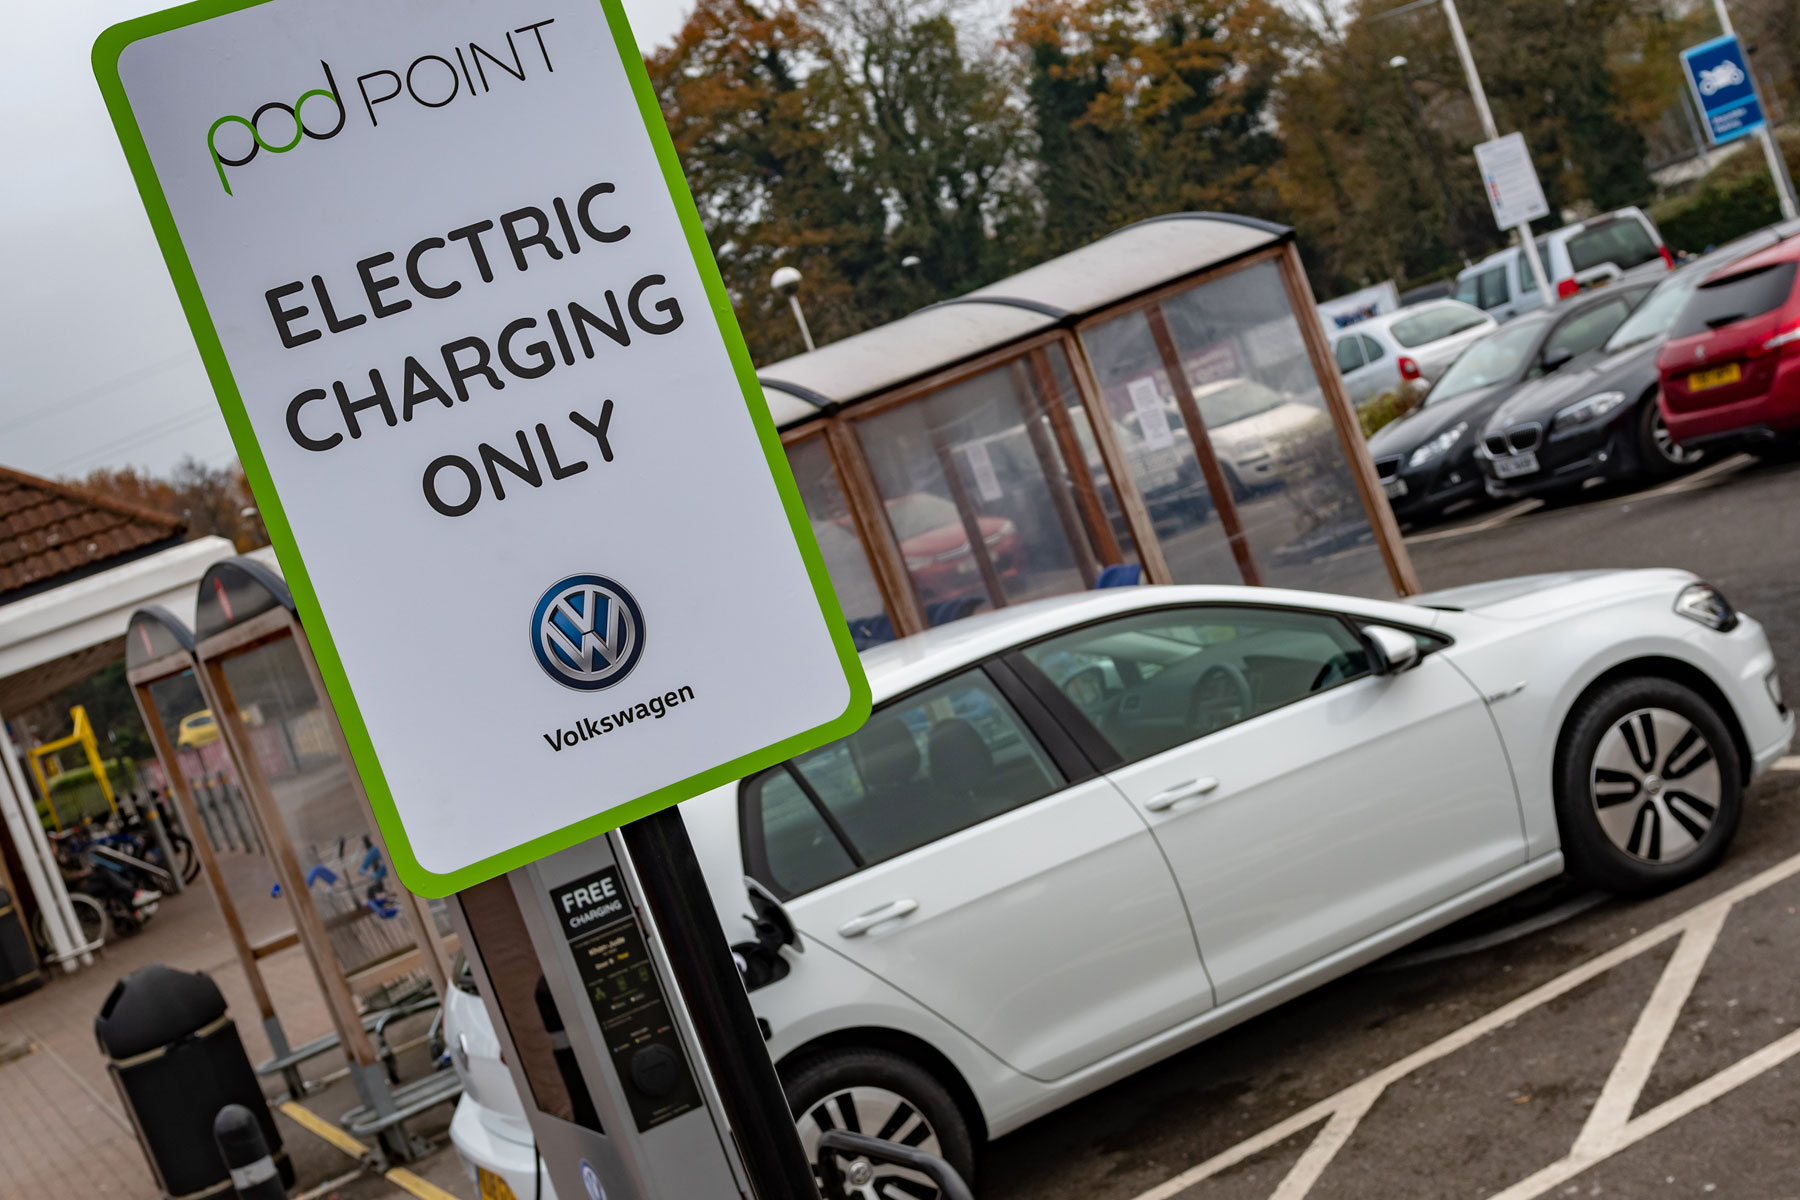 Volkswagen Tesco Pod Point